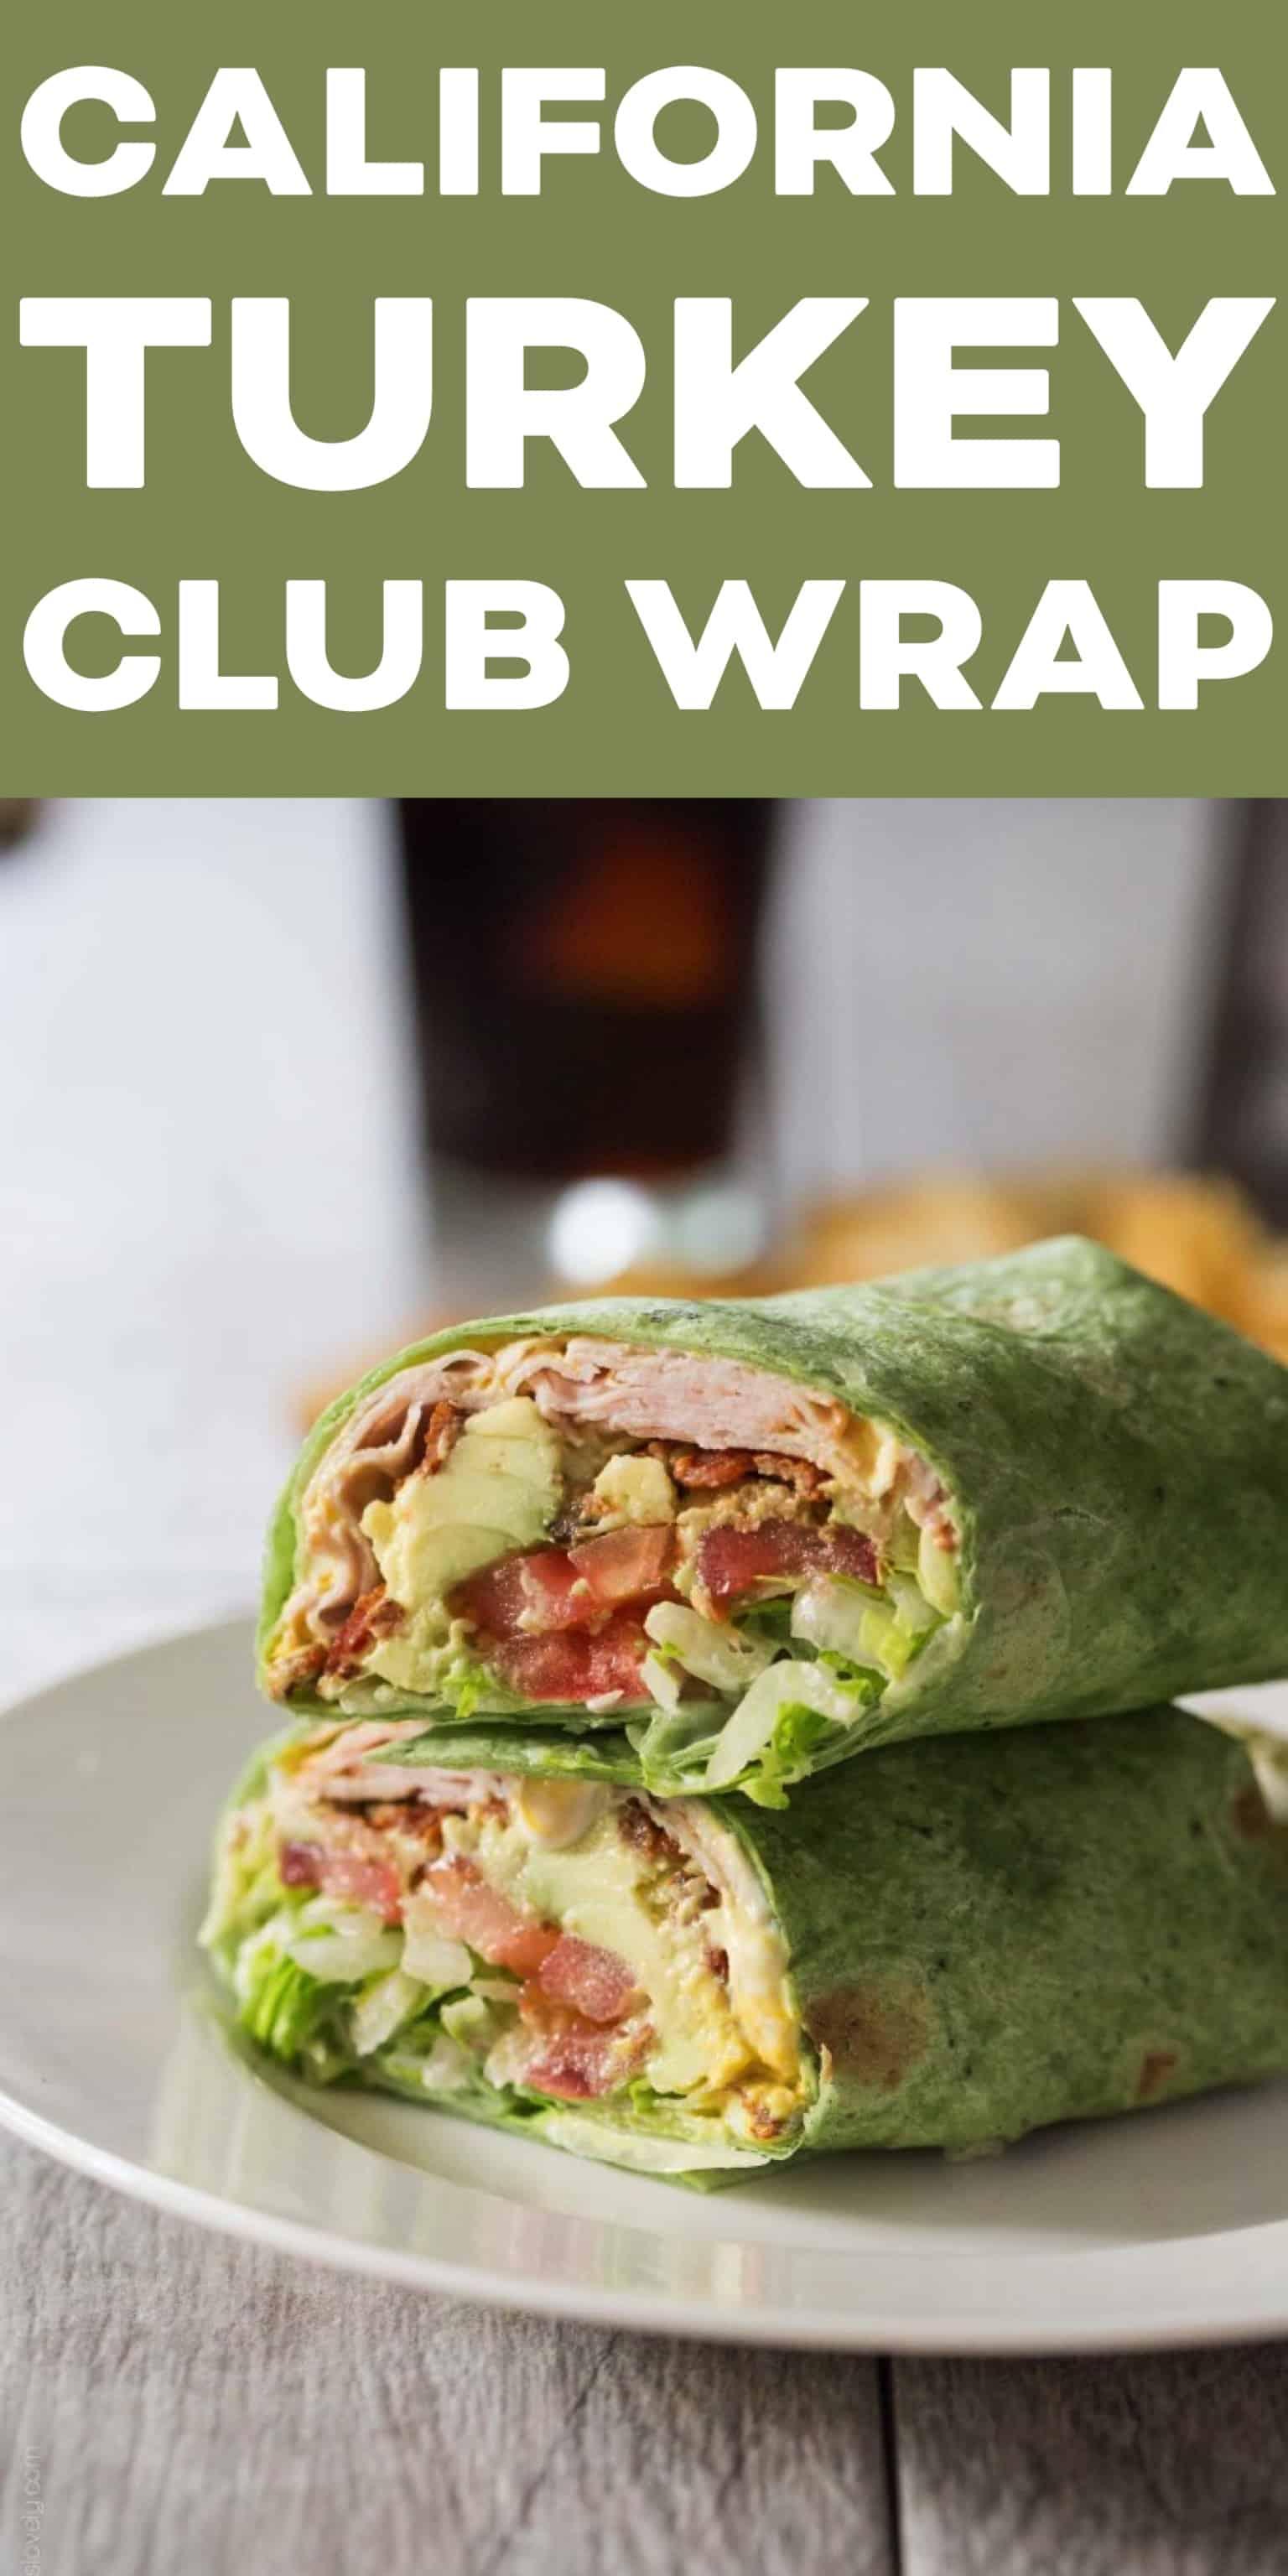 California Turkey Club Wrap - Tastes Lovely